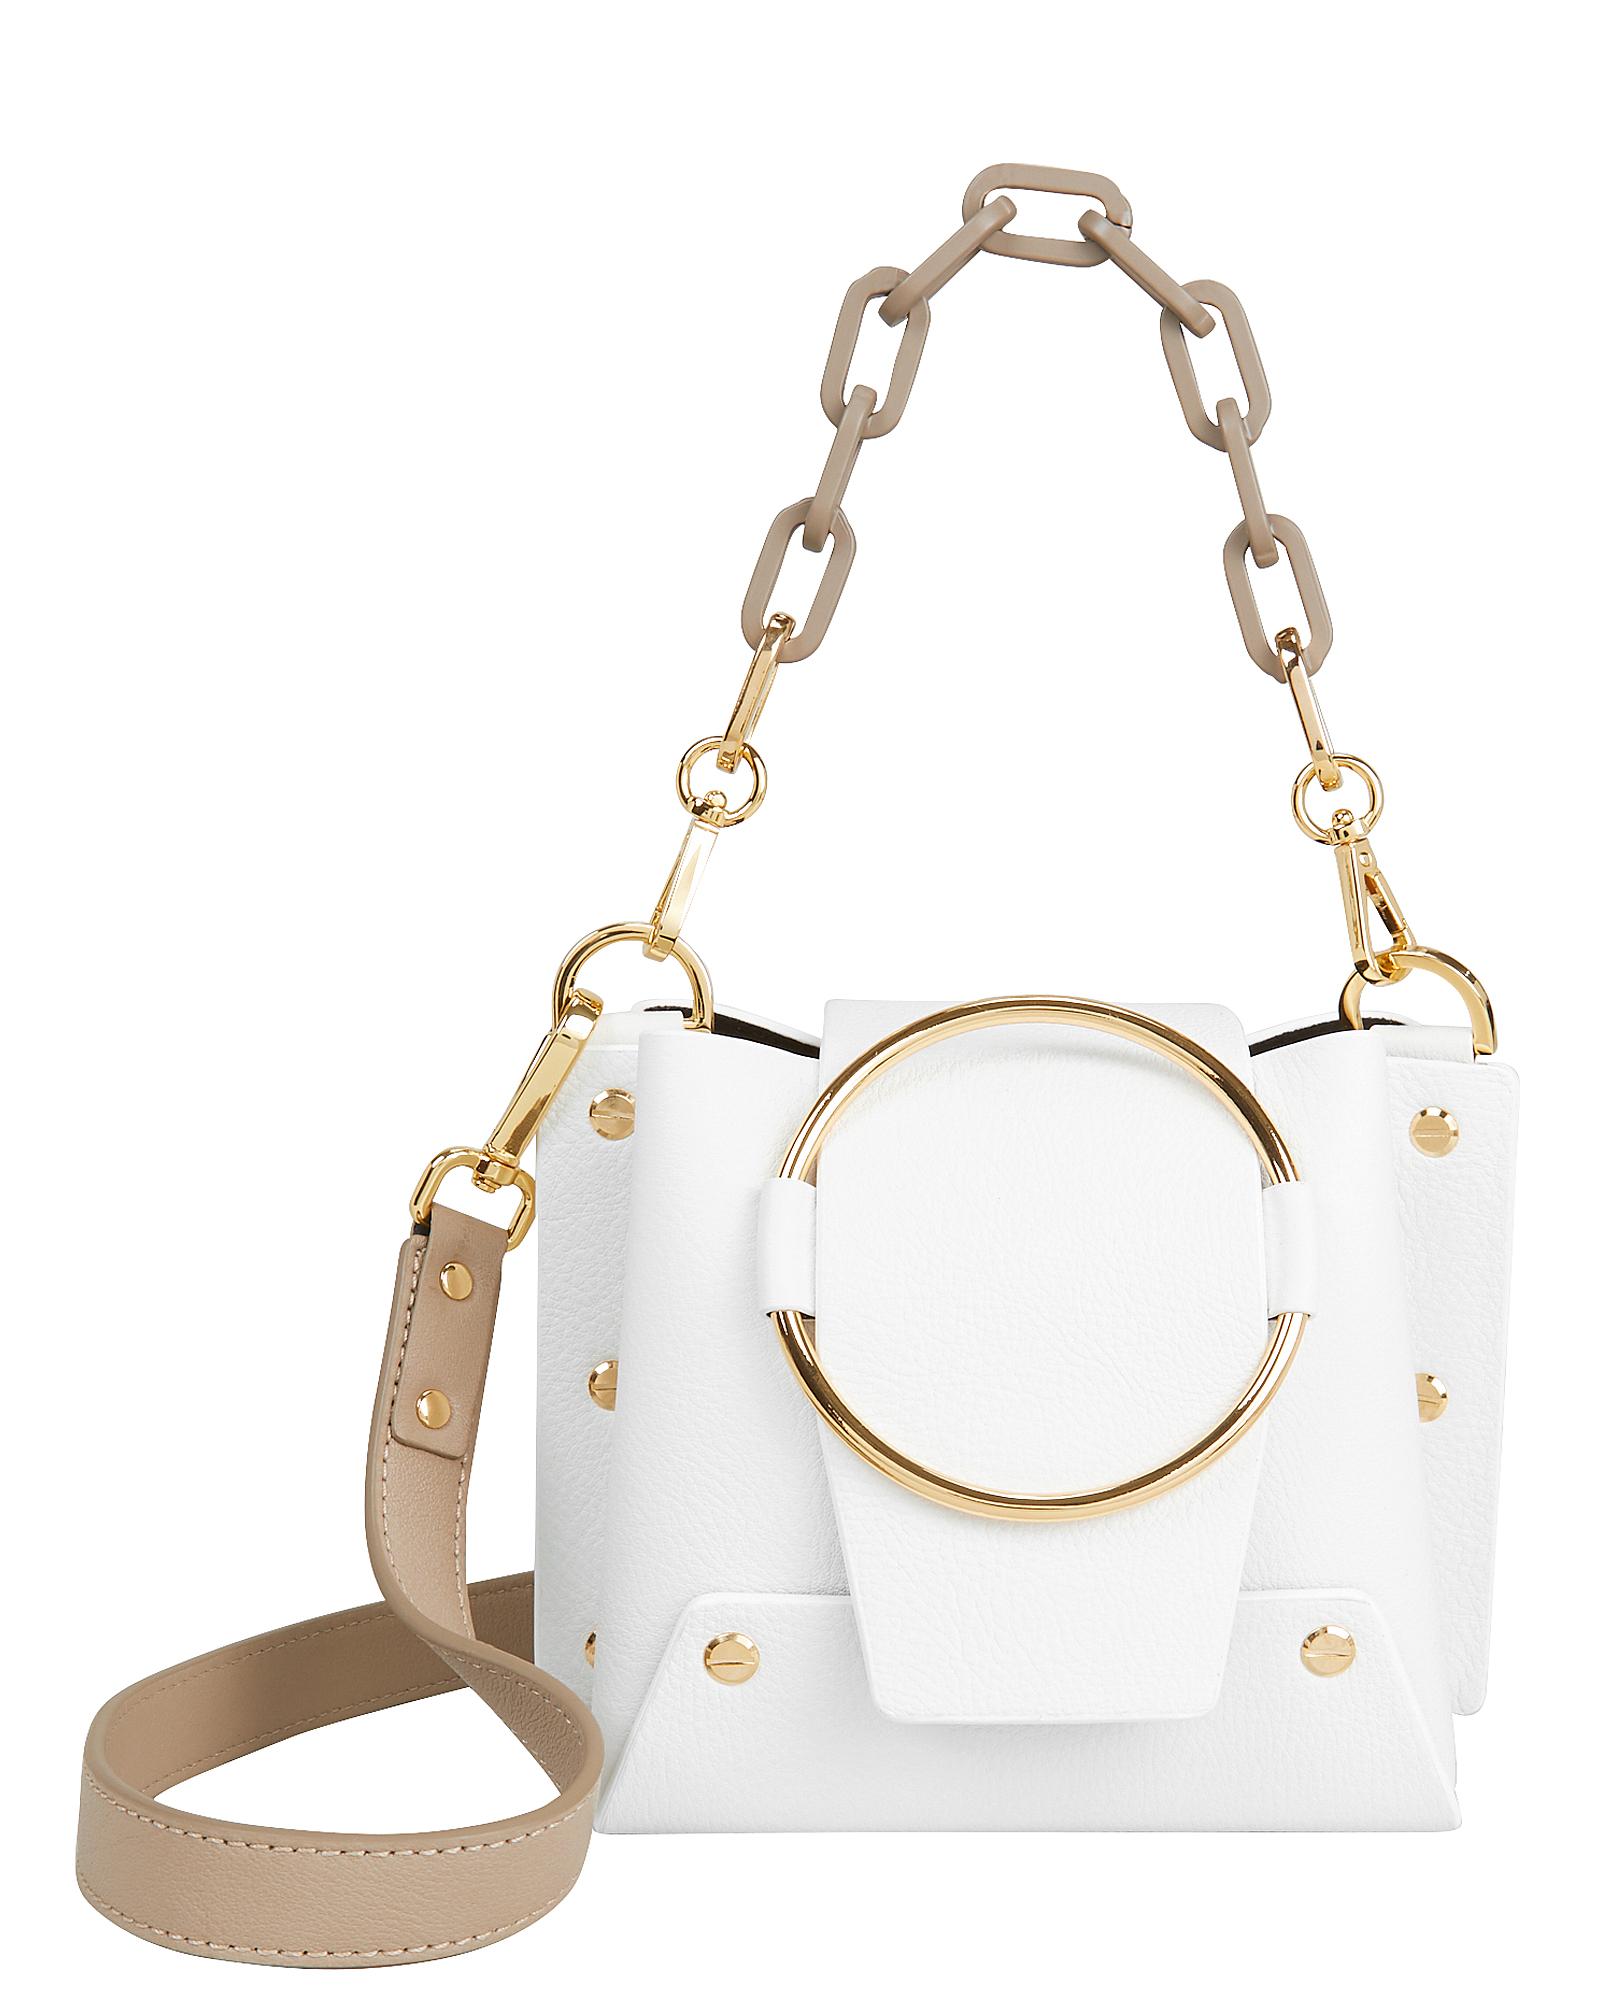 Yuzefi Bags Delila Gold Chain White Bag